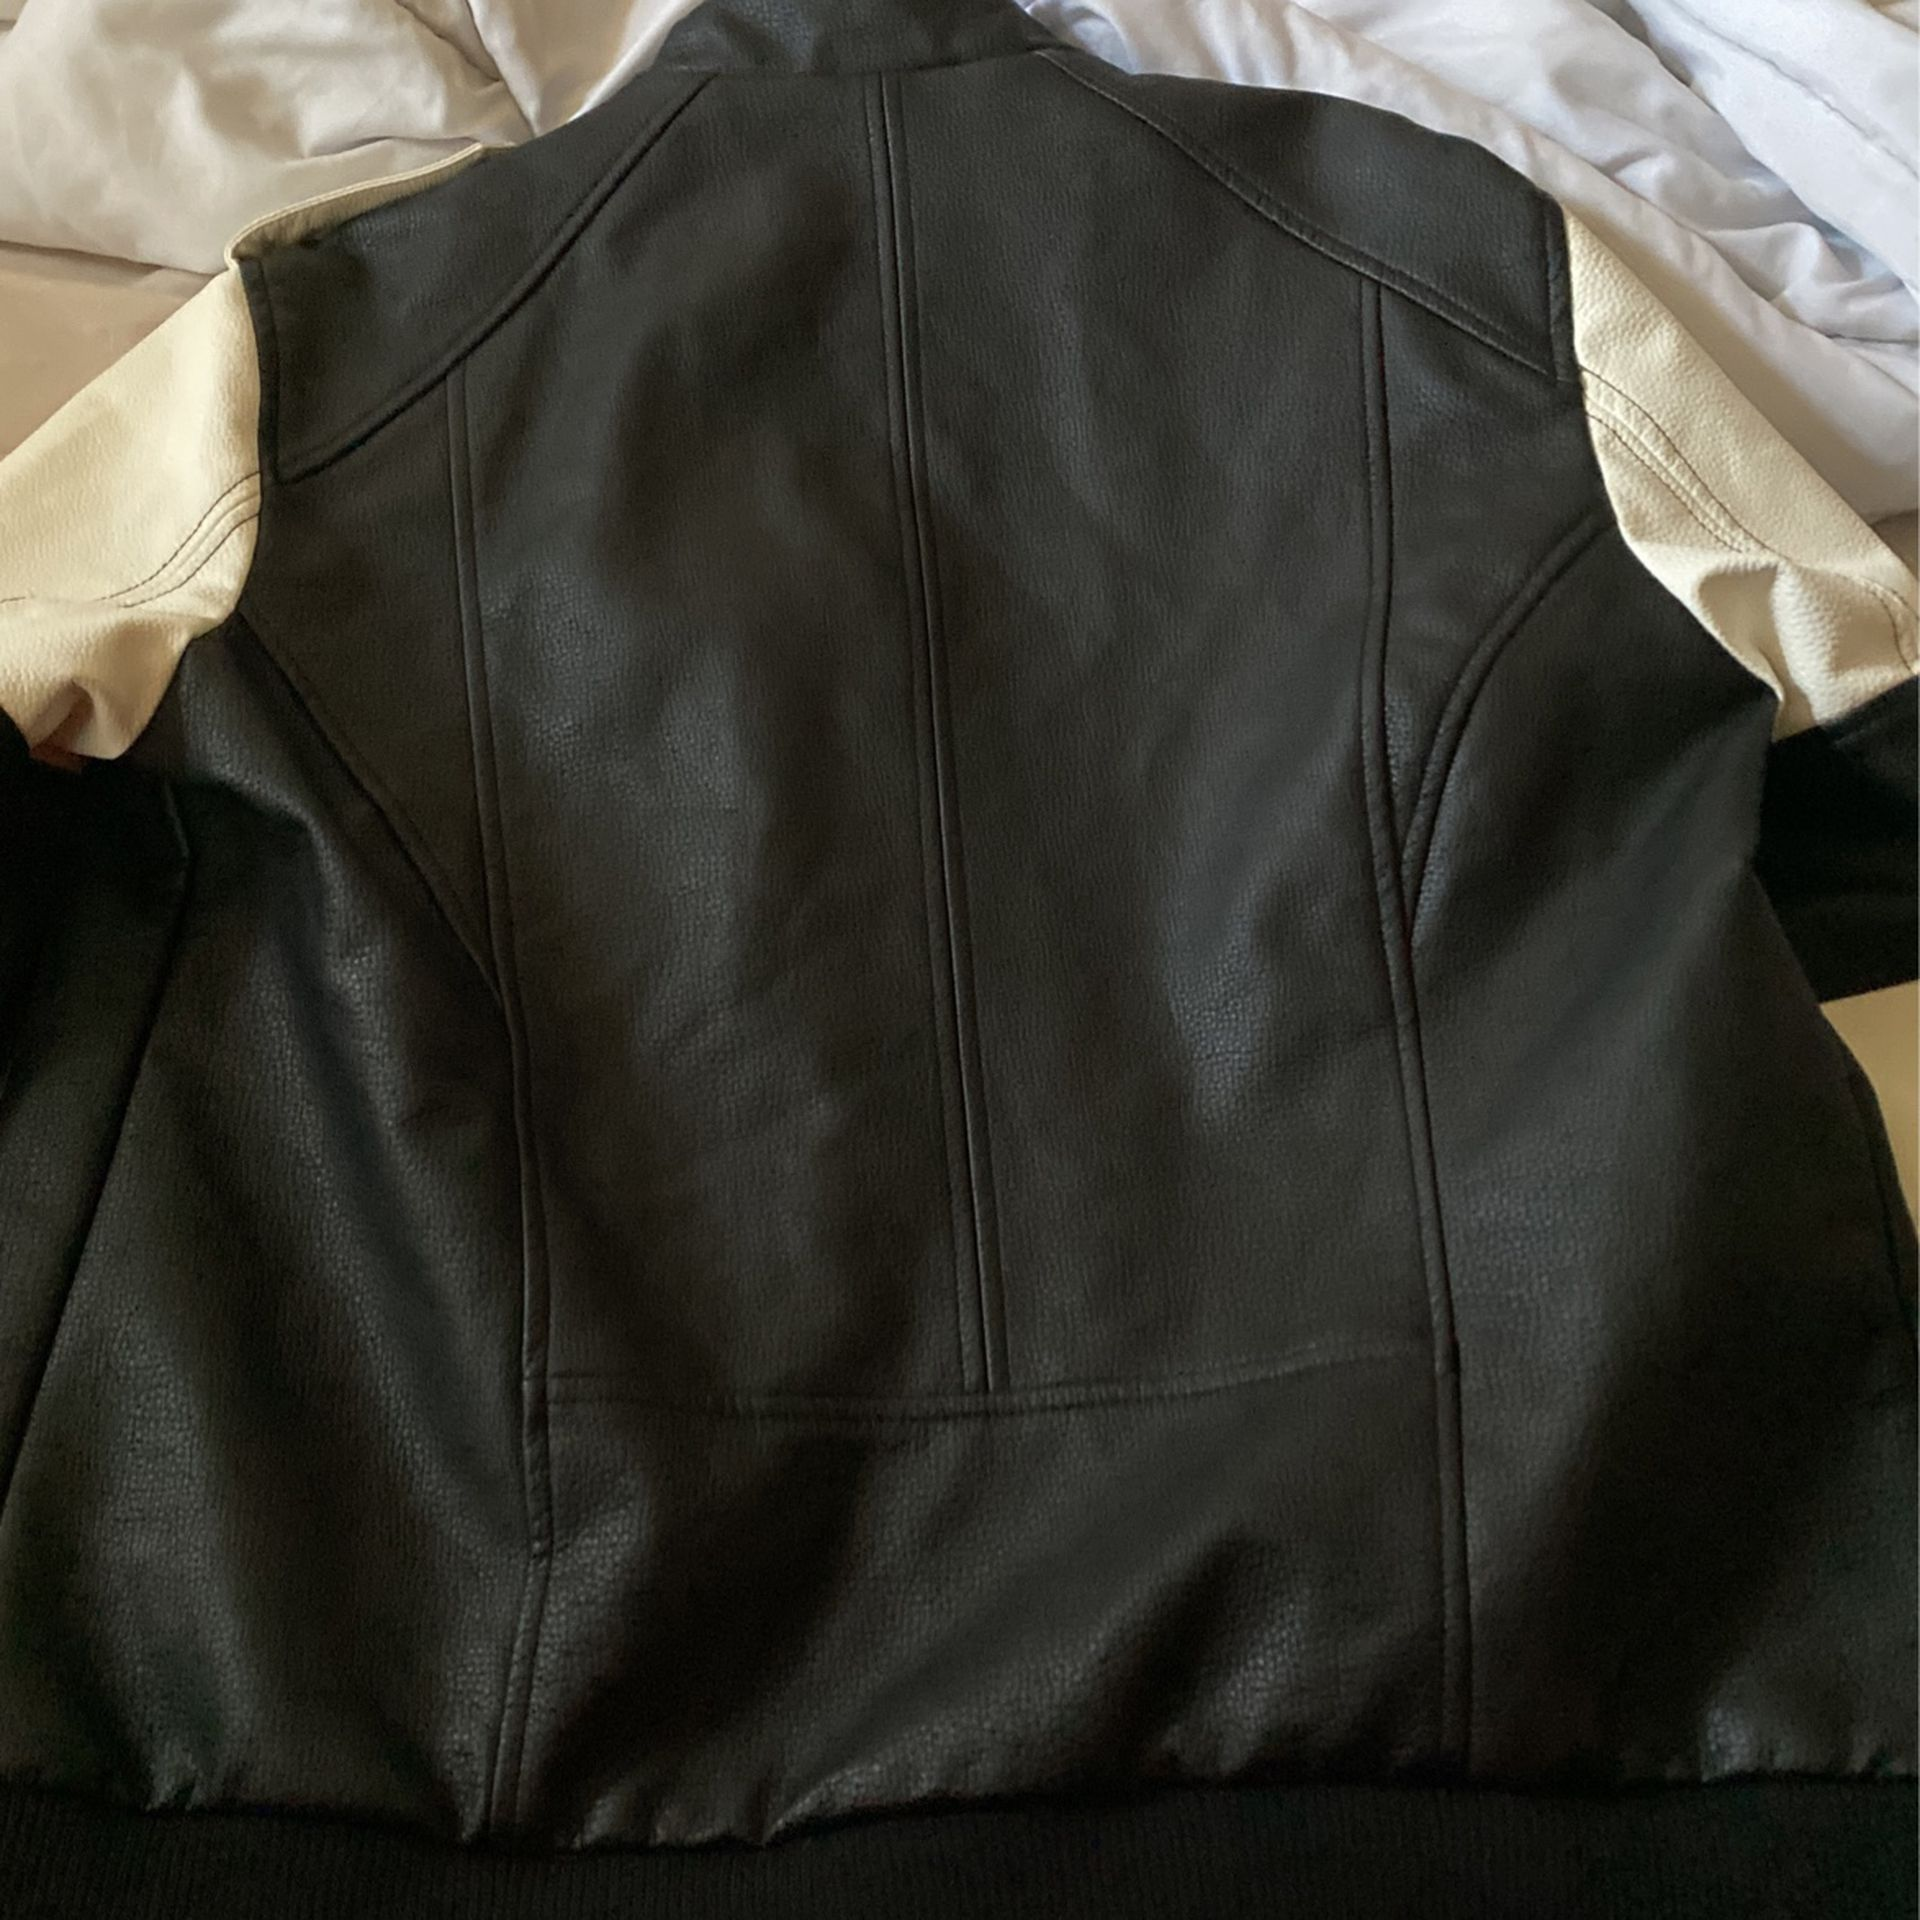 Non Leather jacket Punk/rock